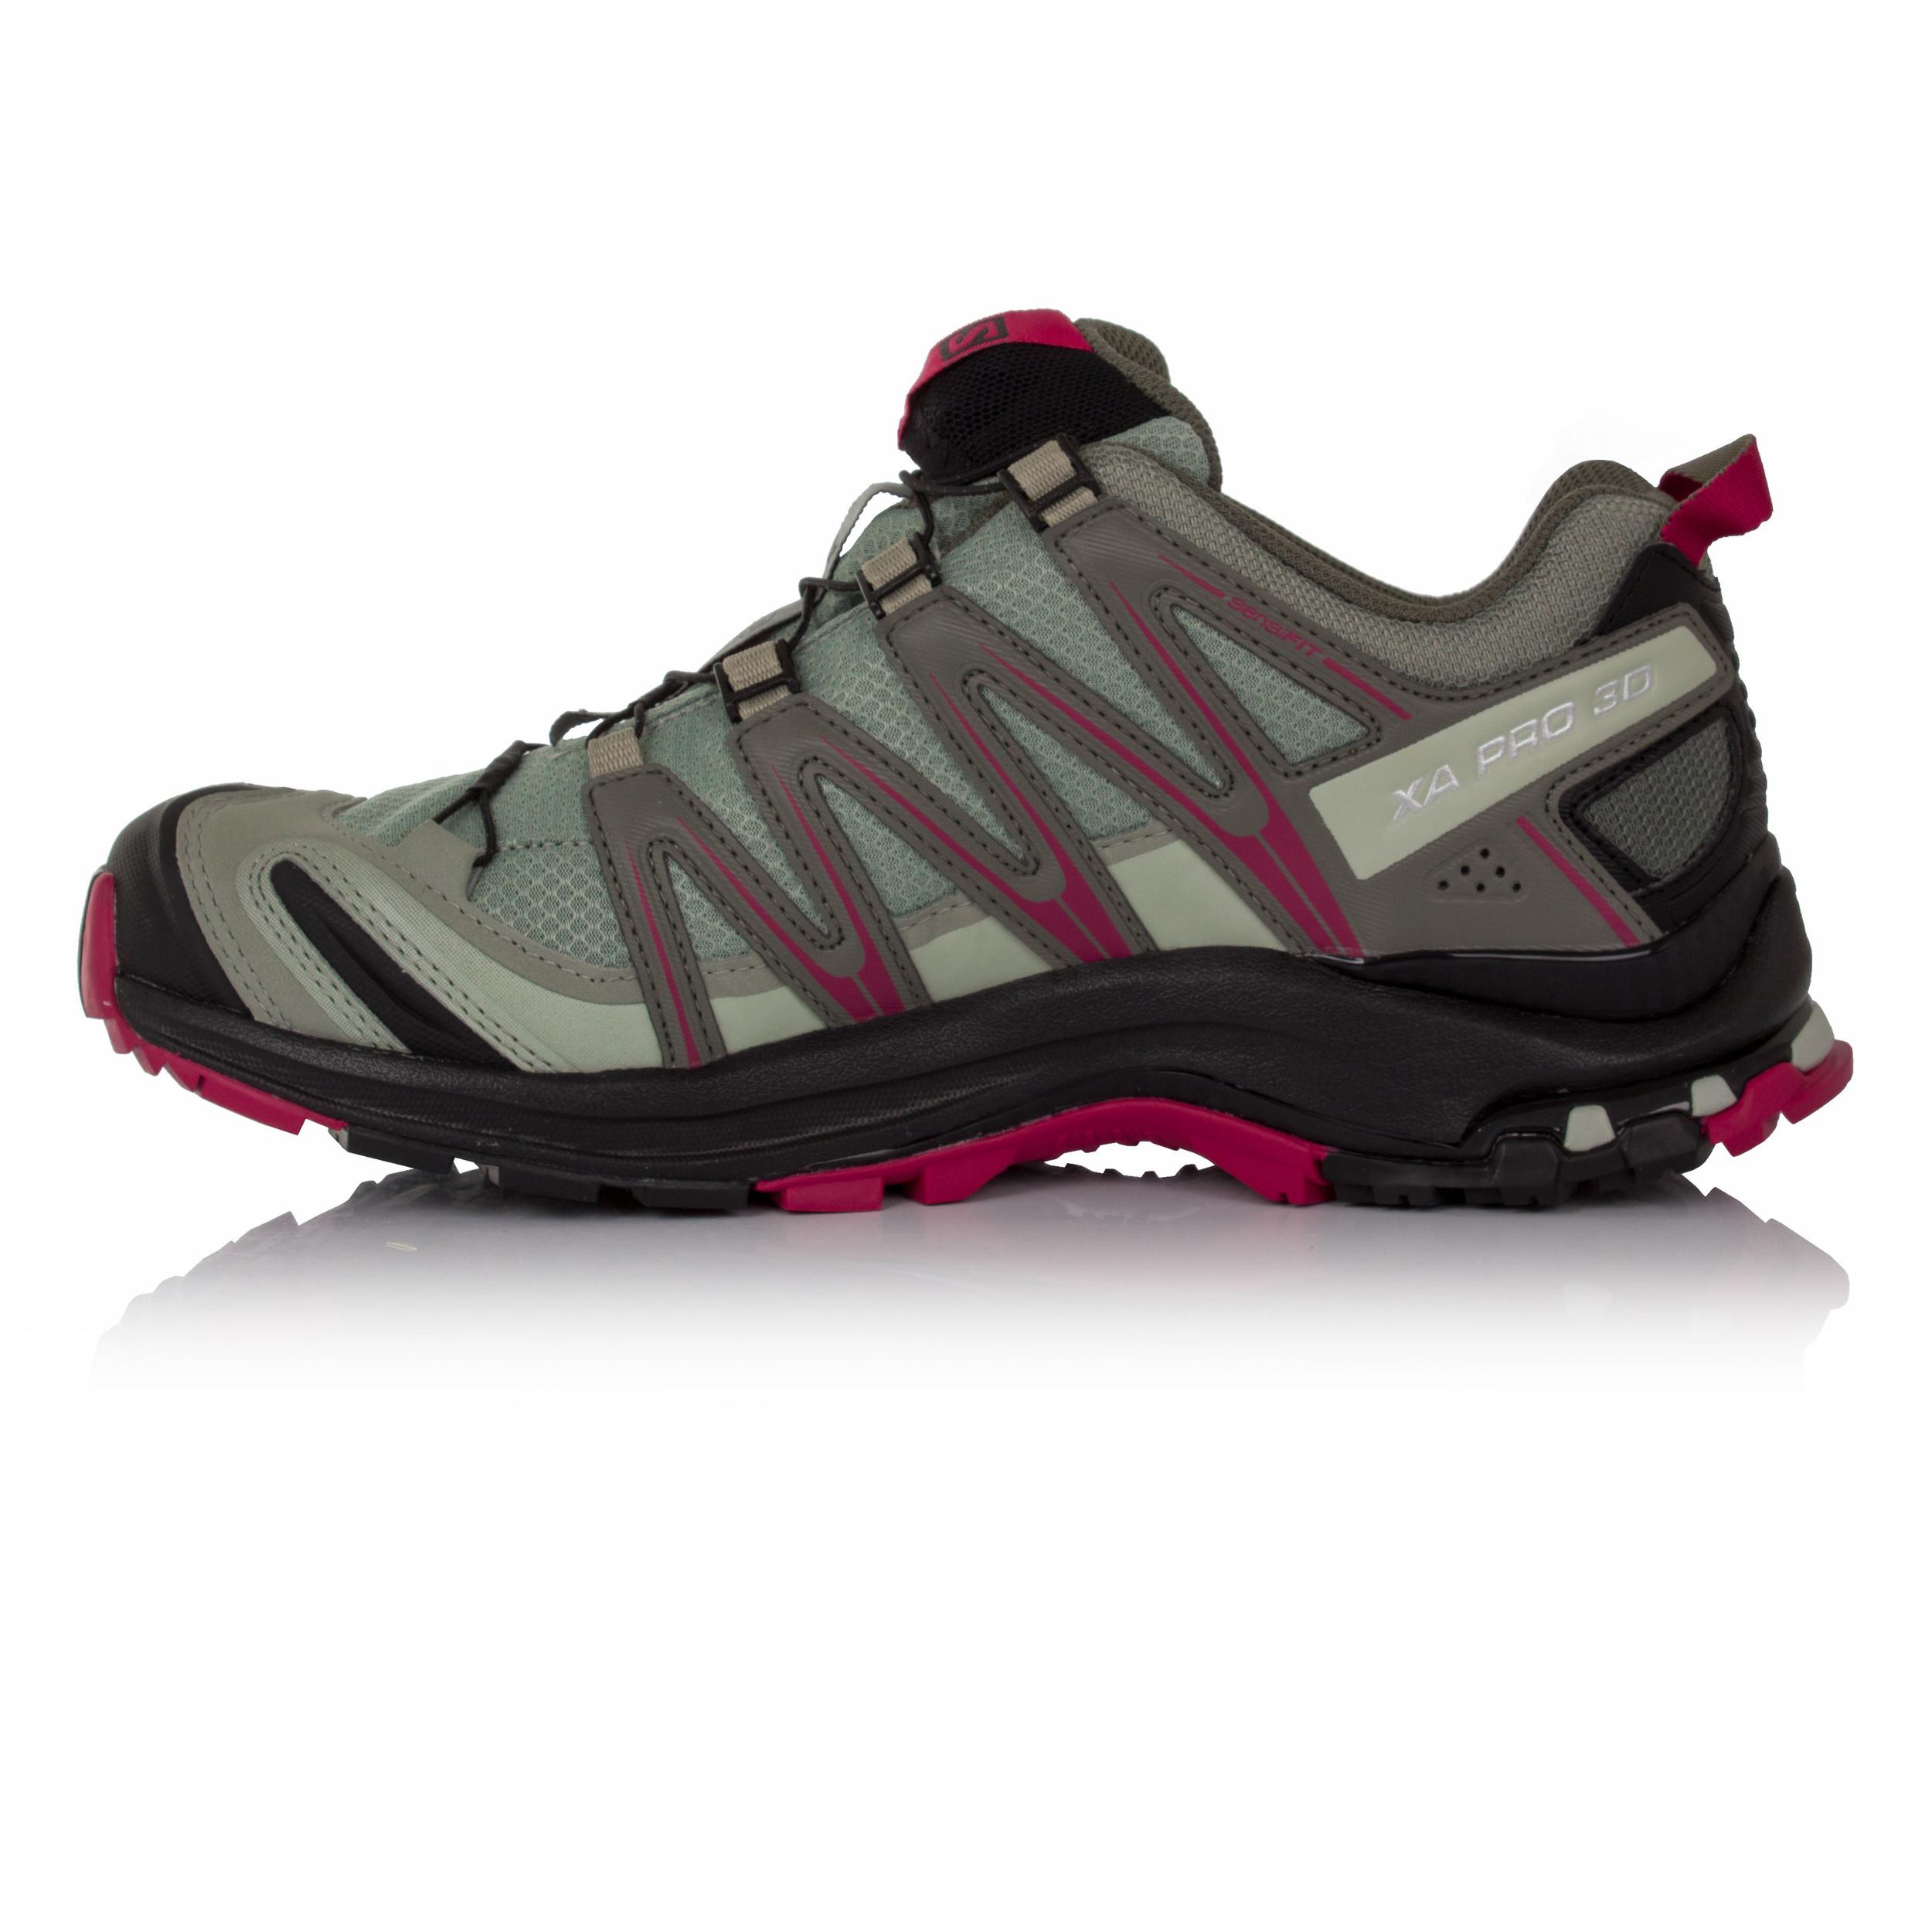 Salomon XA Pro 3D GTX Damen Jogging Trail Laufschuhe Jogging Damen Turnschuhe Sportschuhe Grau d5ebb6